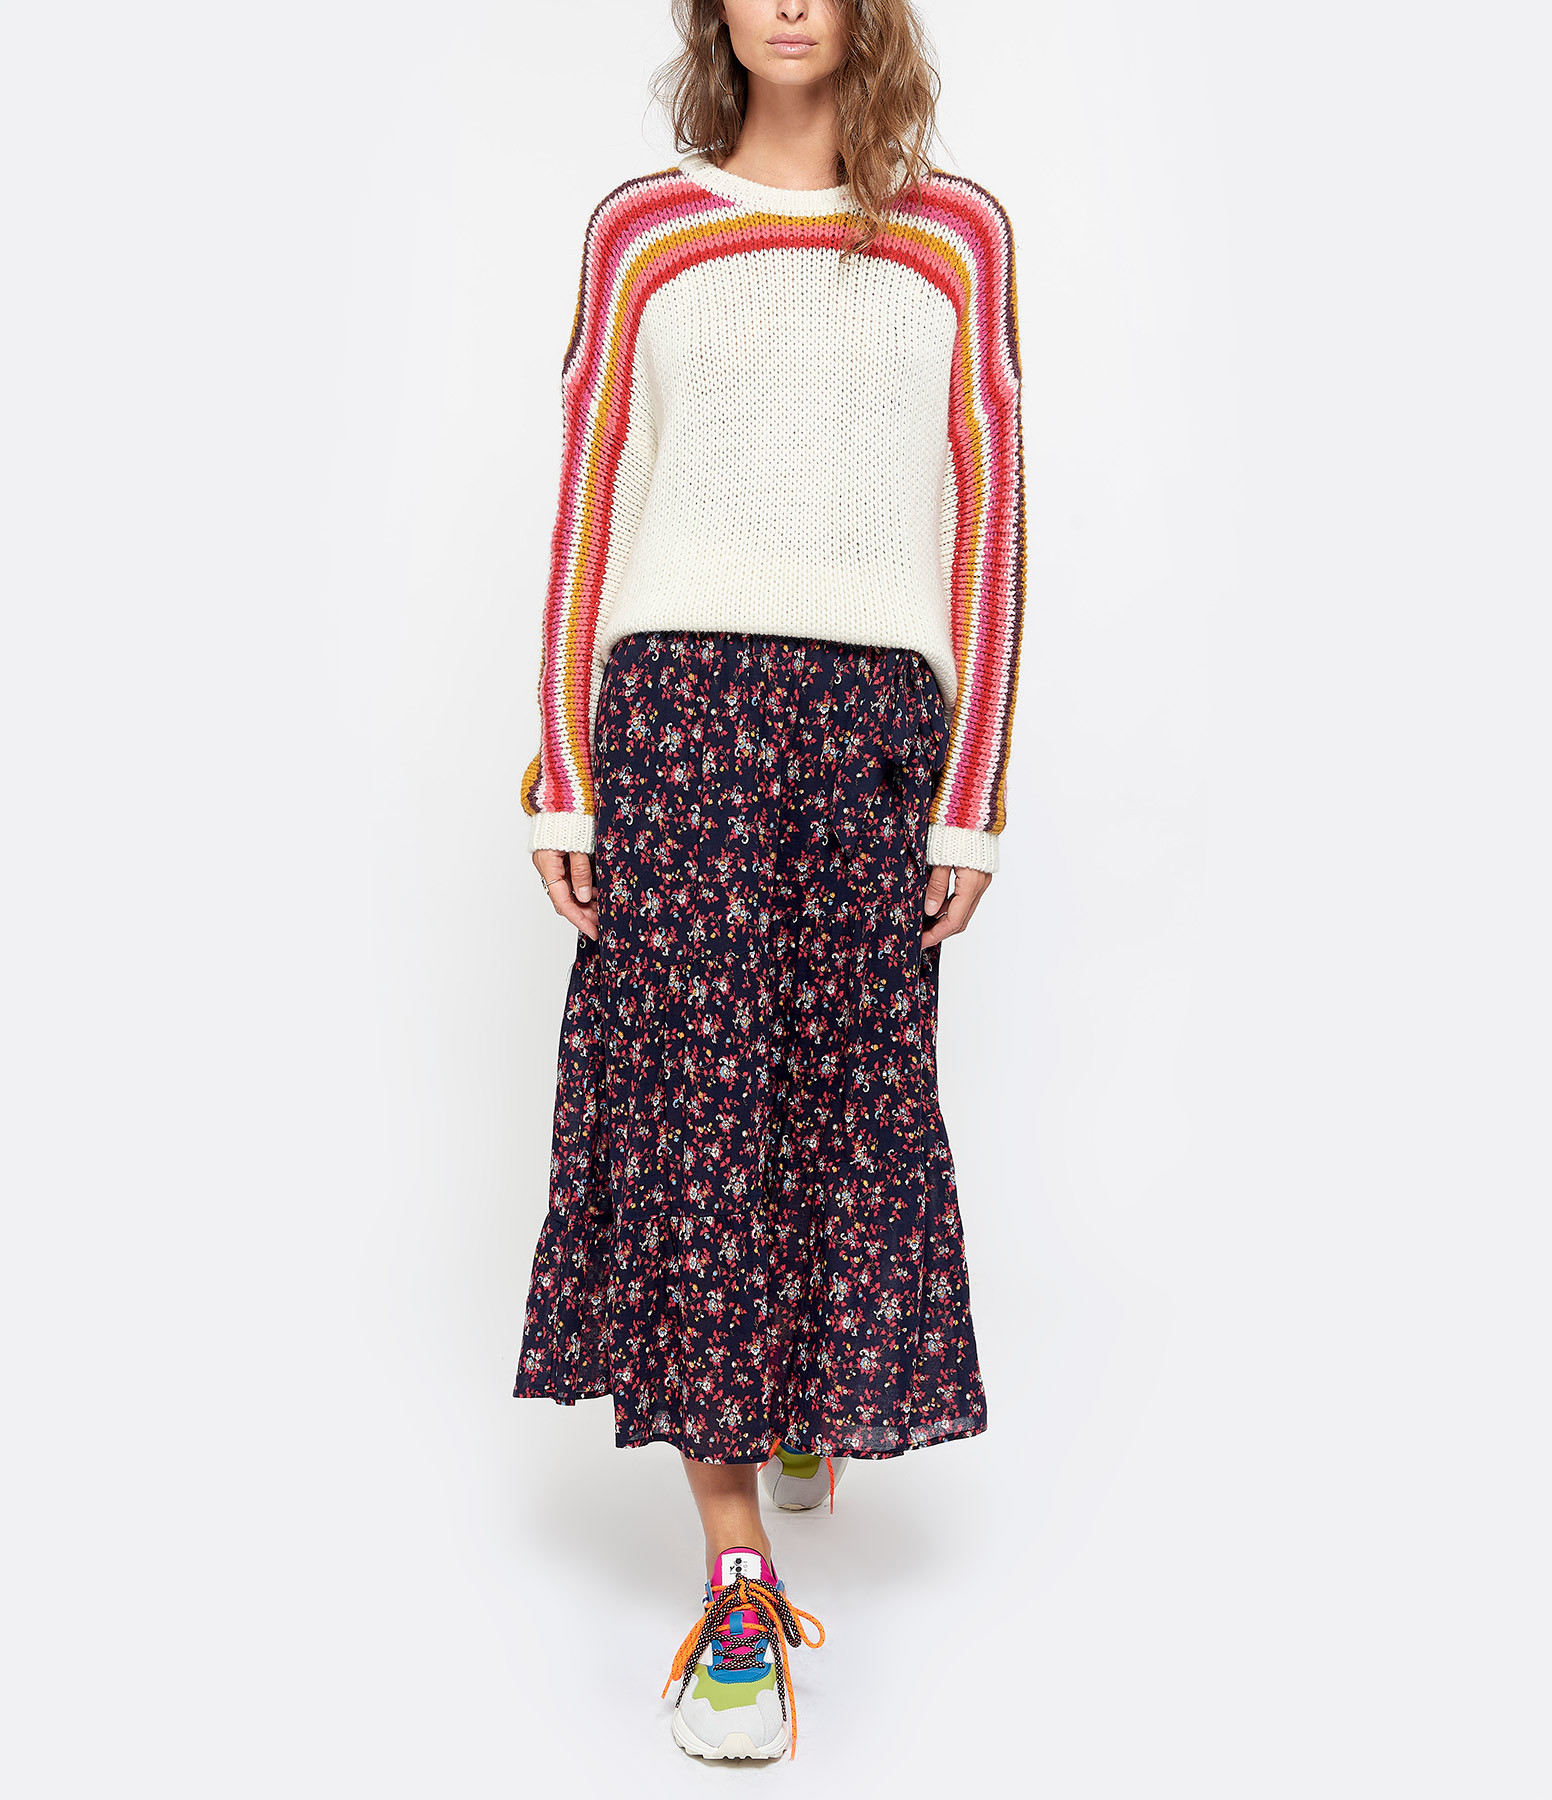 XIRENA - Sweatshirt Coton Rouge